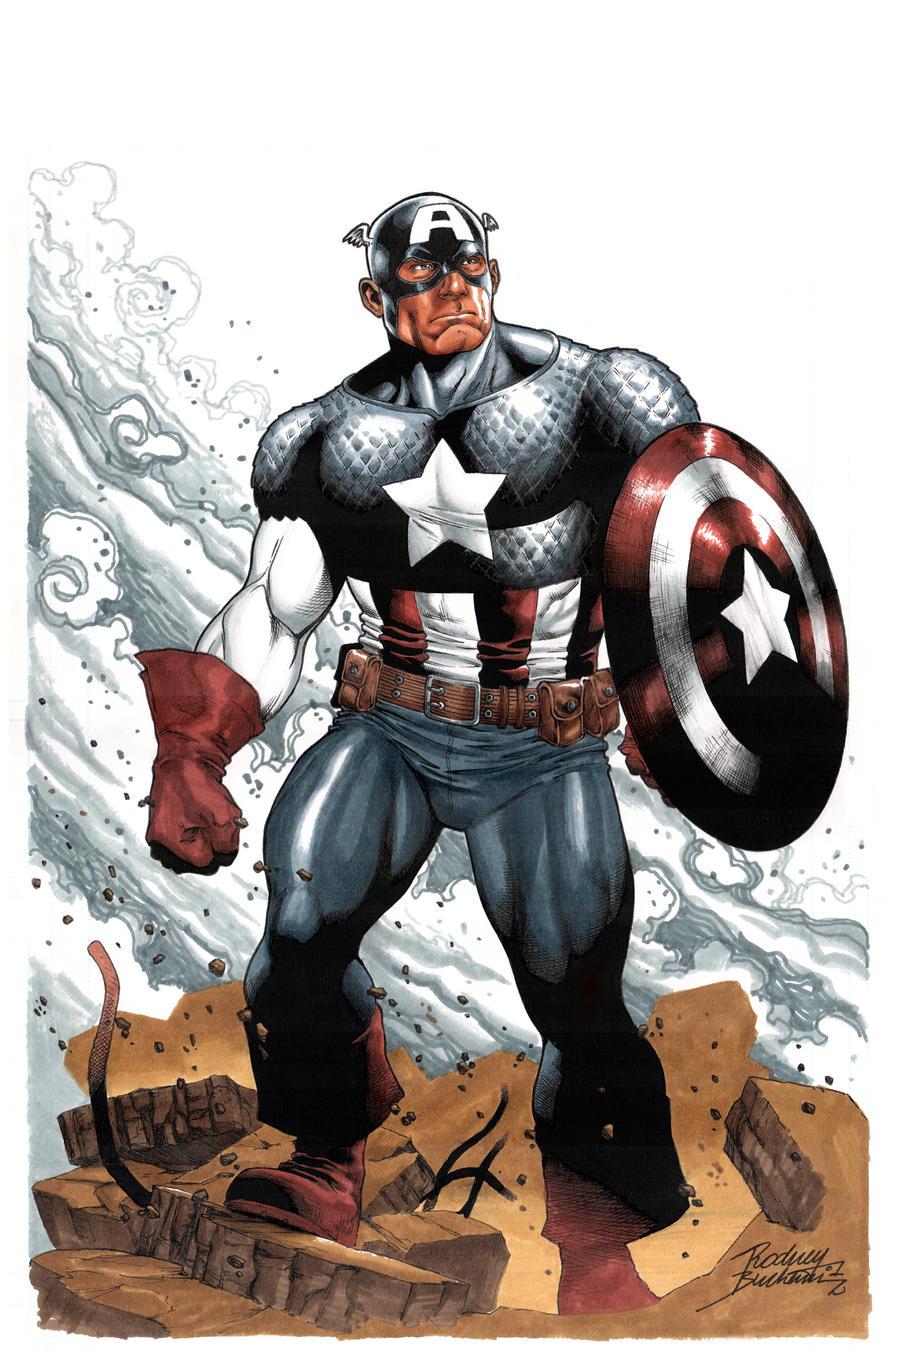 Captain America commission by Buchemi